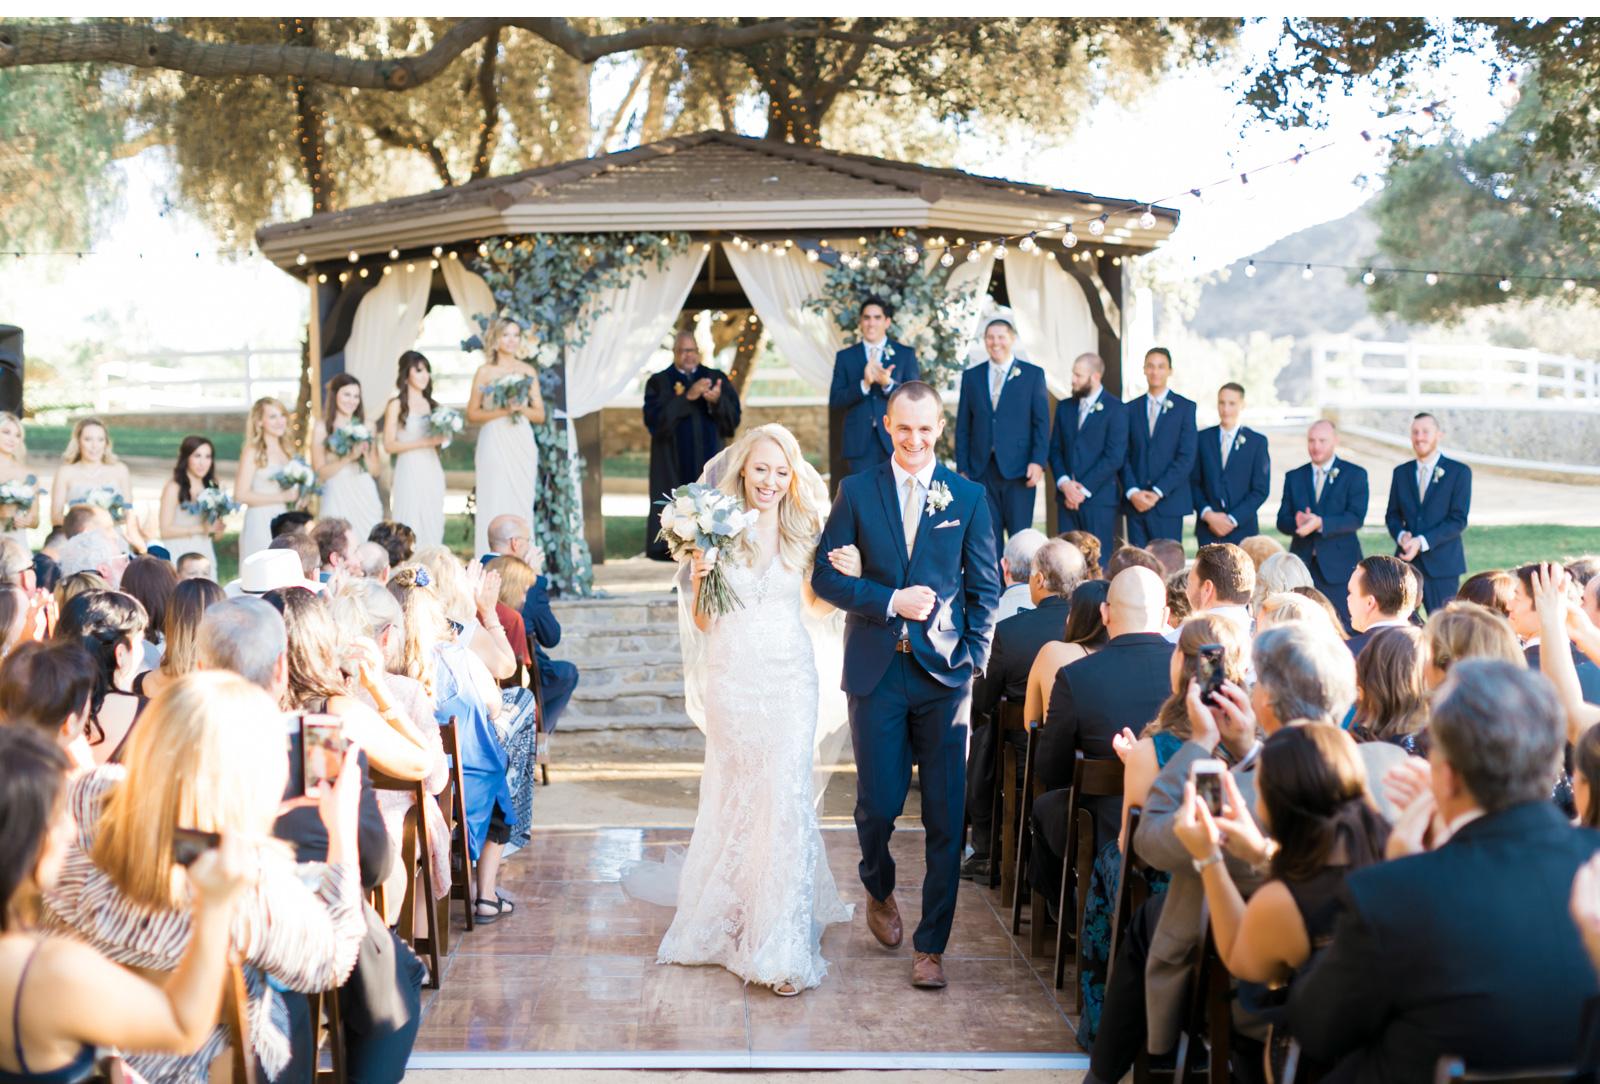 Style-Me-Pretty-Wedding-Photographer-Natalie-Schutt-Photography-Calfornia-San-Luis-Obispo_07.jpg